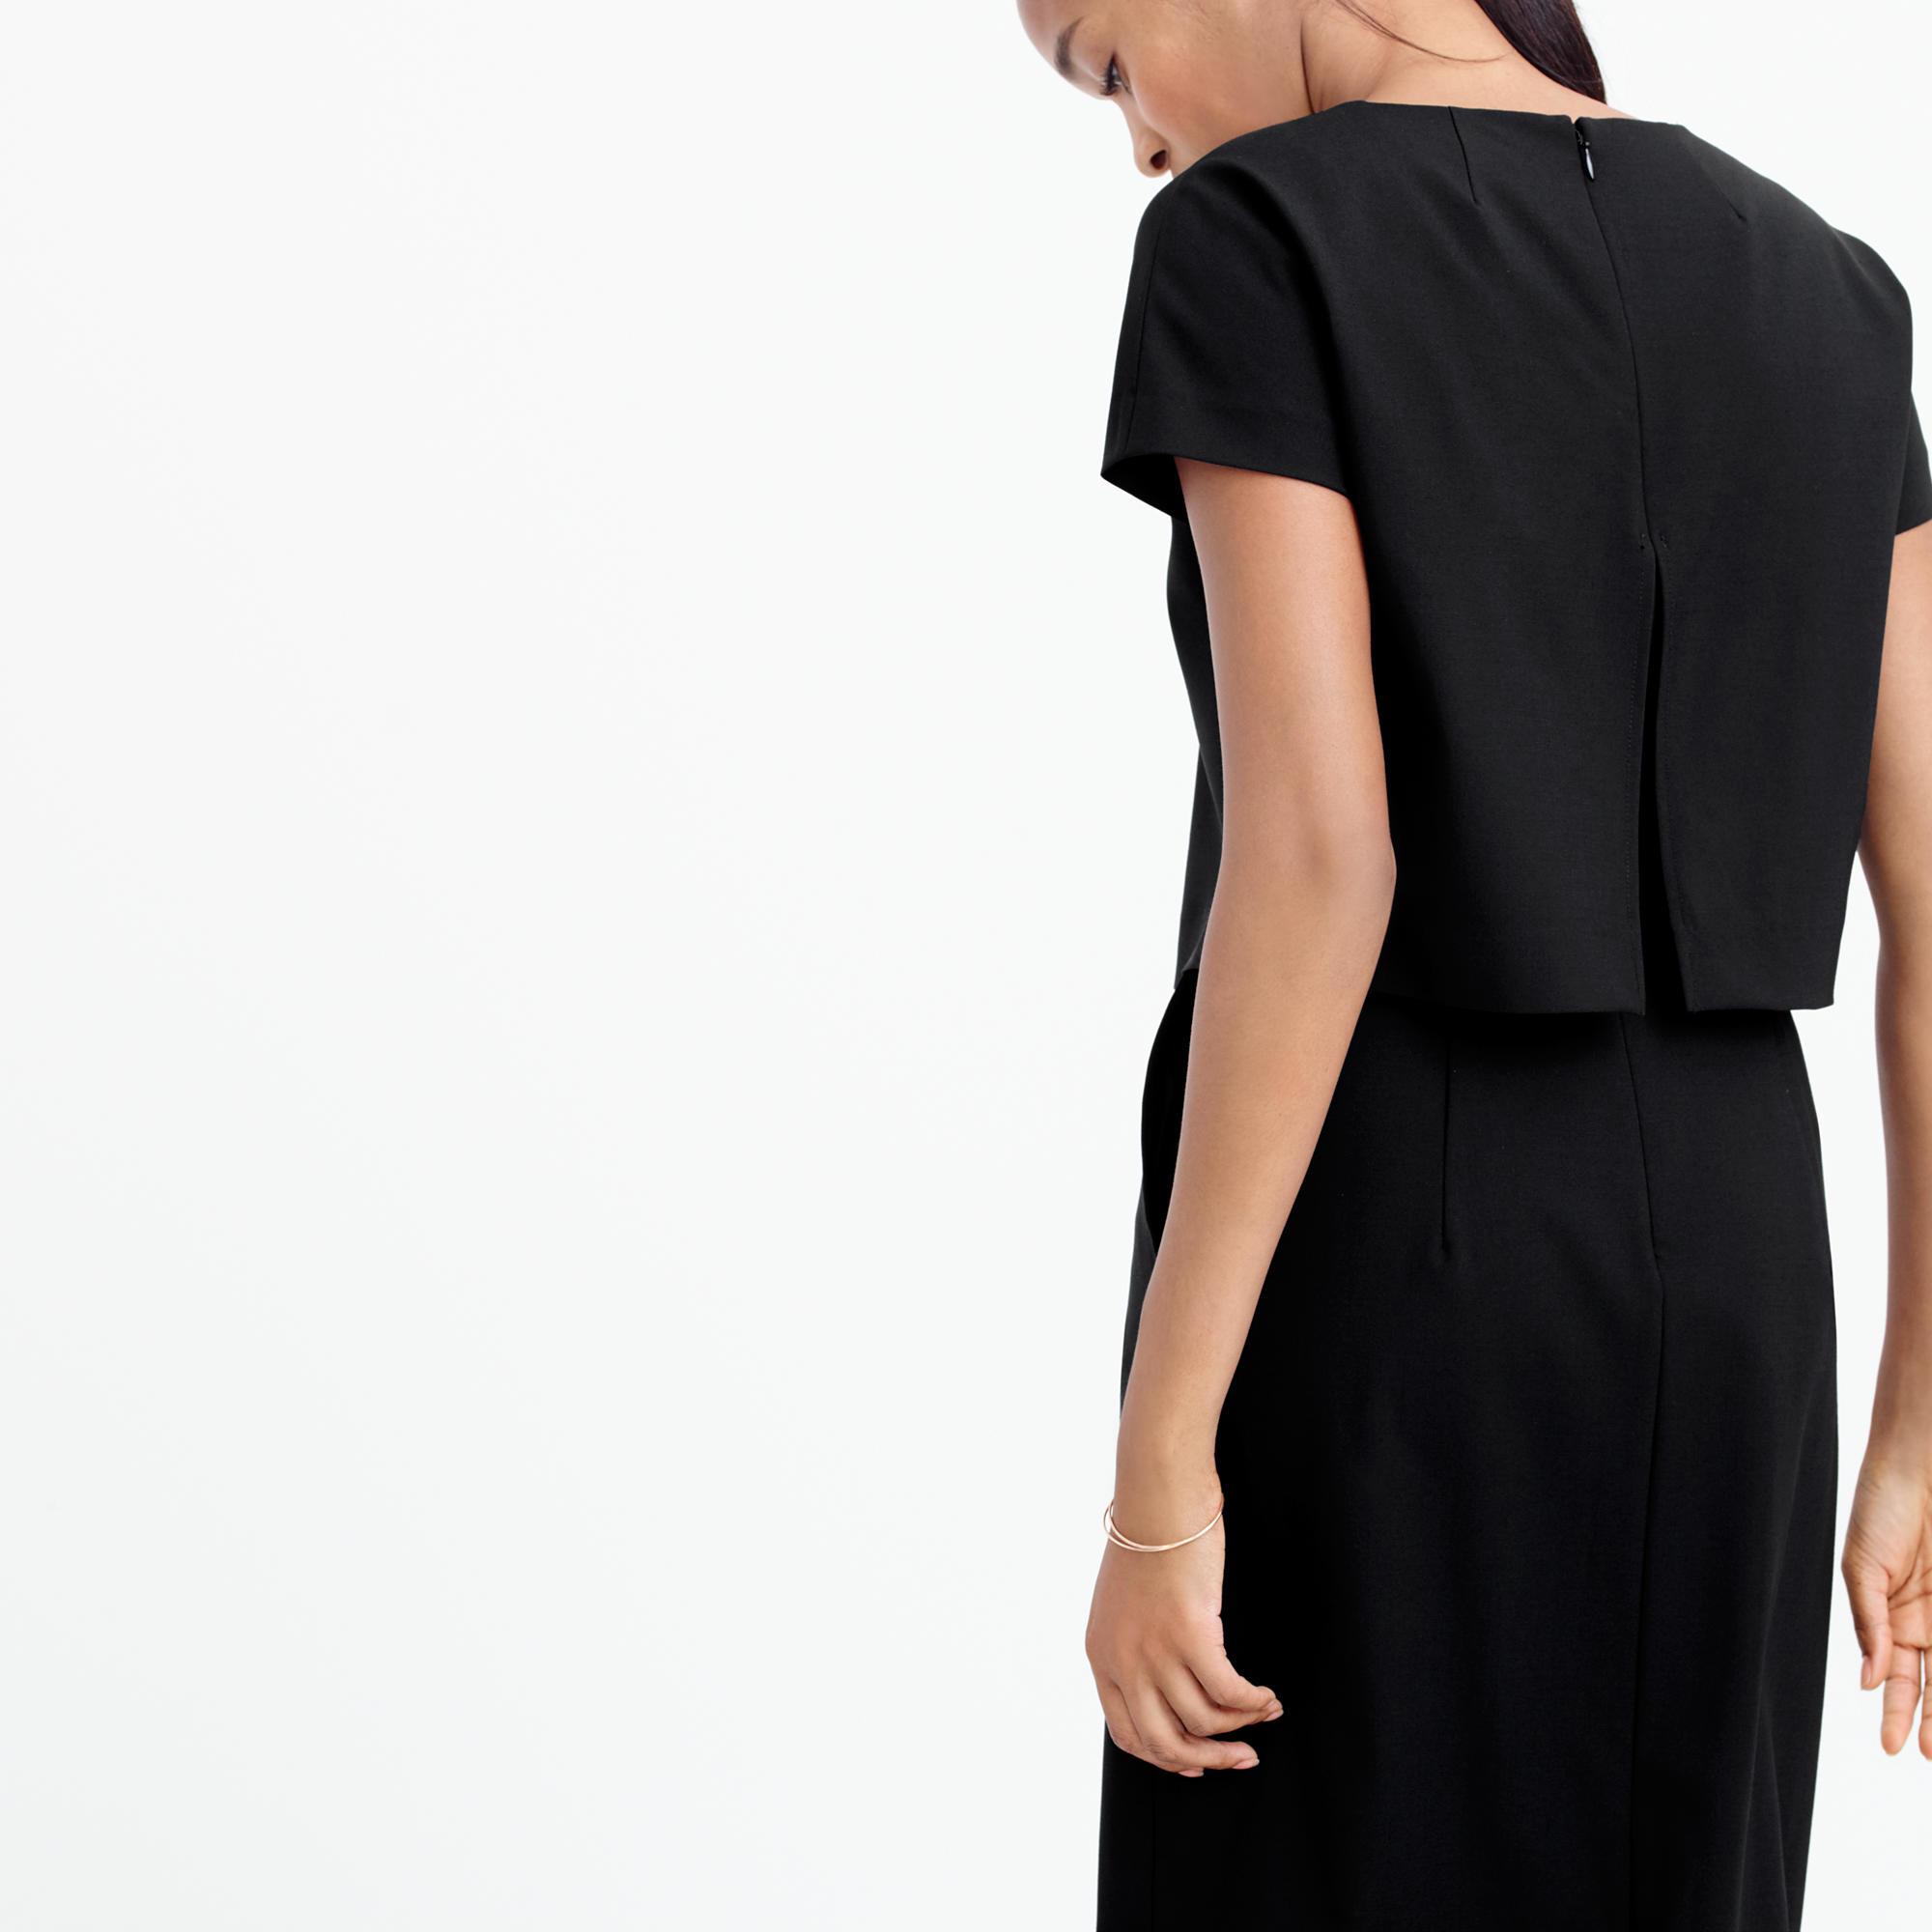 Black dress j crew - Be Inspired